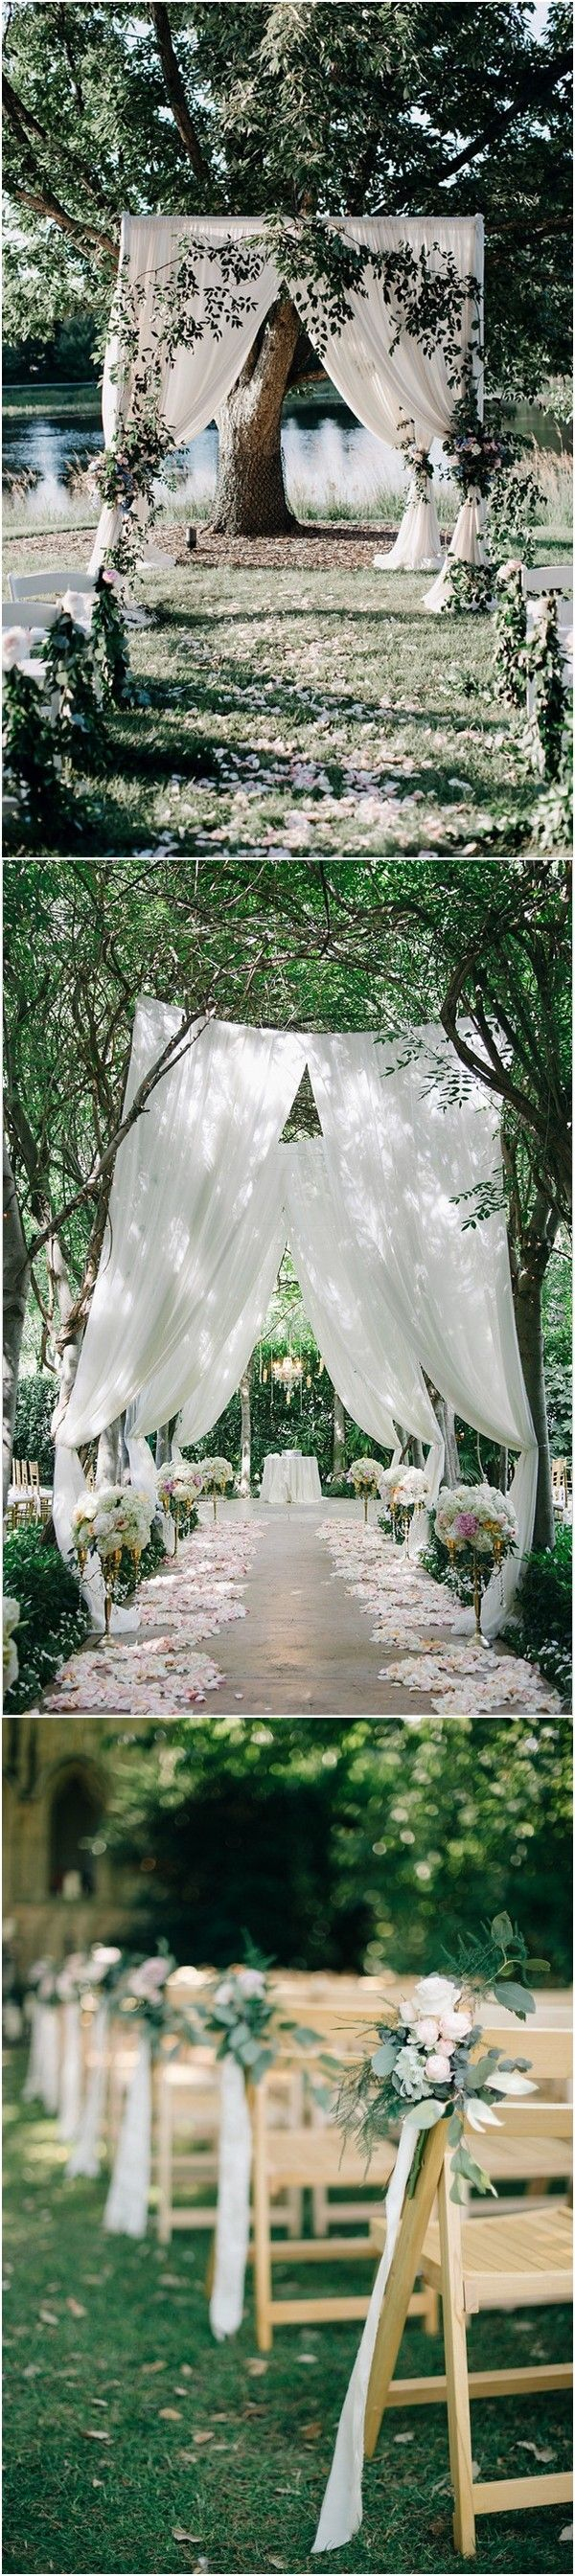 25 Brilliant Garden Wedding Decoration Ideas for 2018 Trends - Page ...